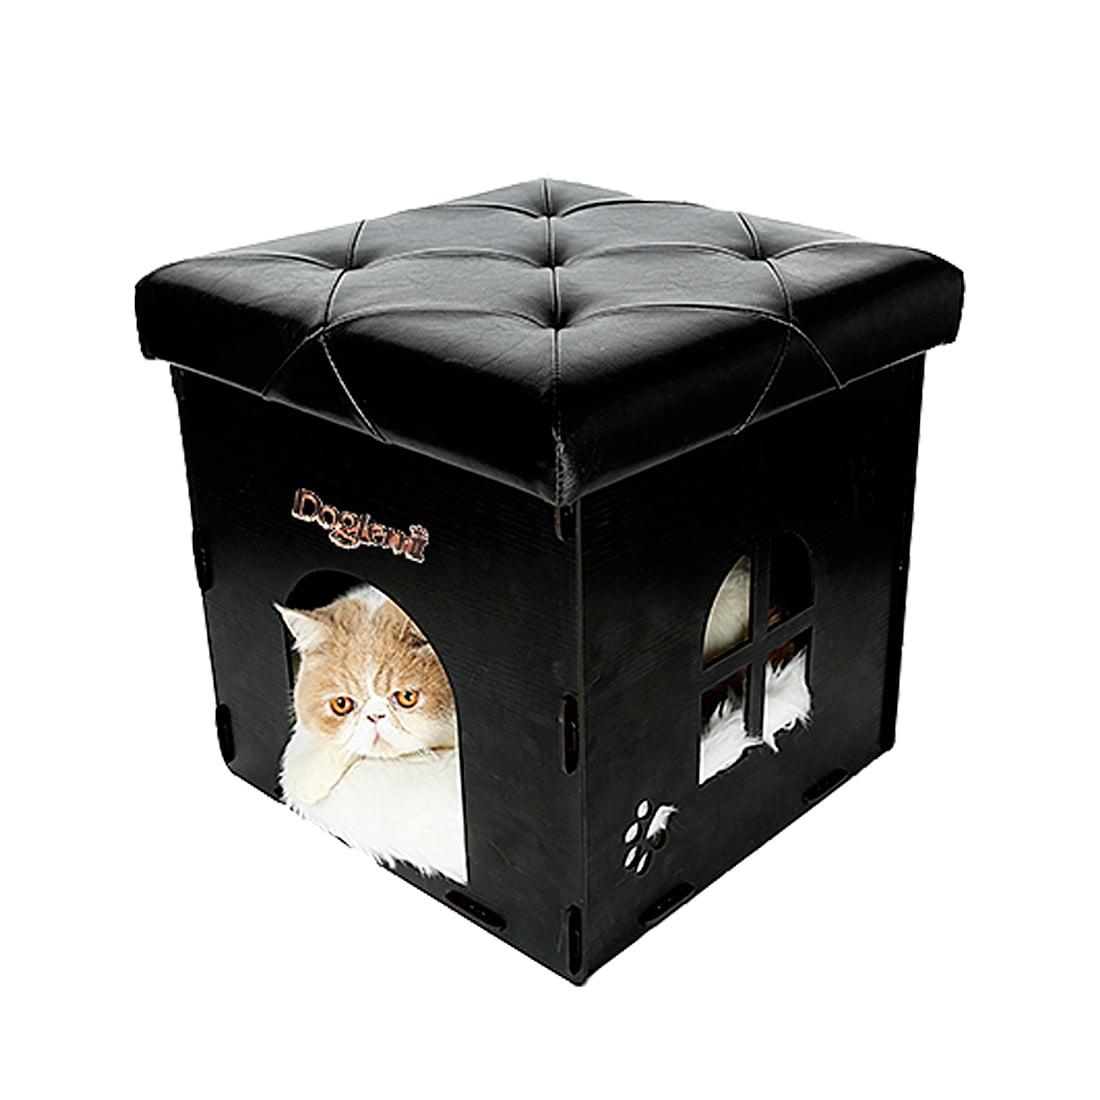 soft ottoman design cat cube house multi function pet cat